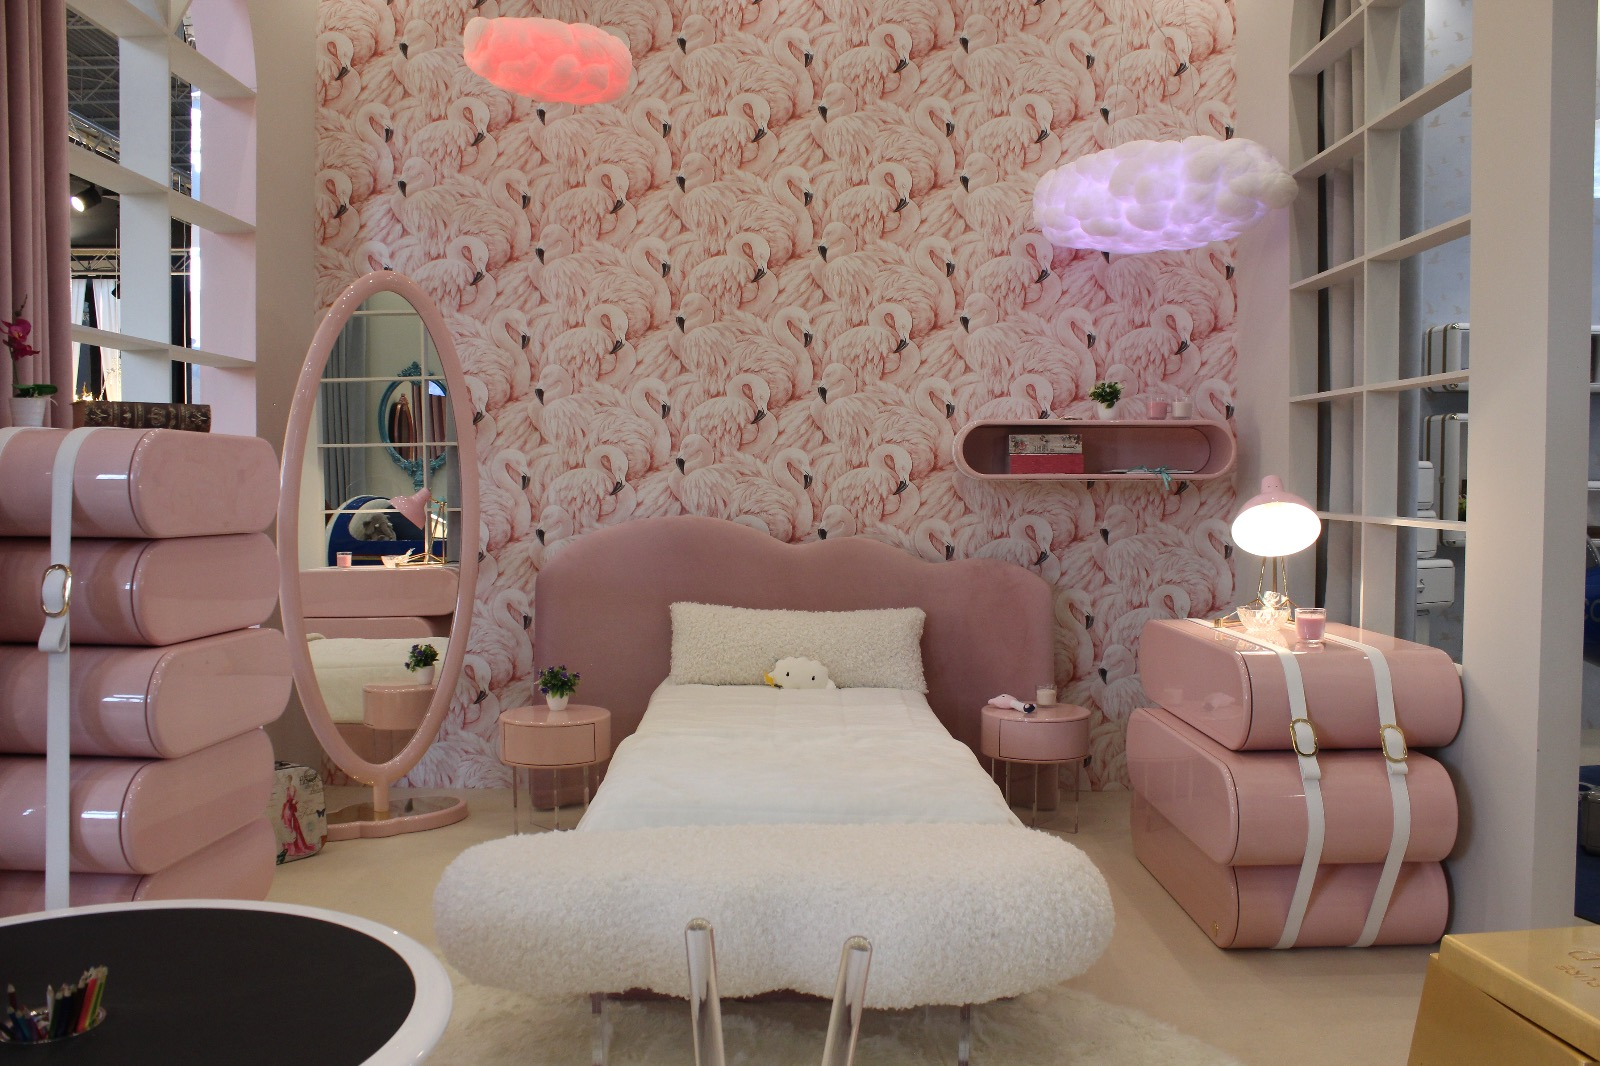 Amazing Girl Room by Circu at Maison et Objet 2019 Maison et Objet 2019 Highlights of Maison et Objet 2019 Circus Girl Room   Covet Group